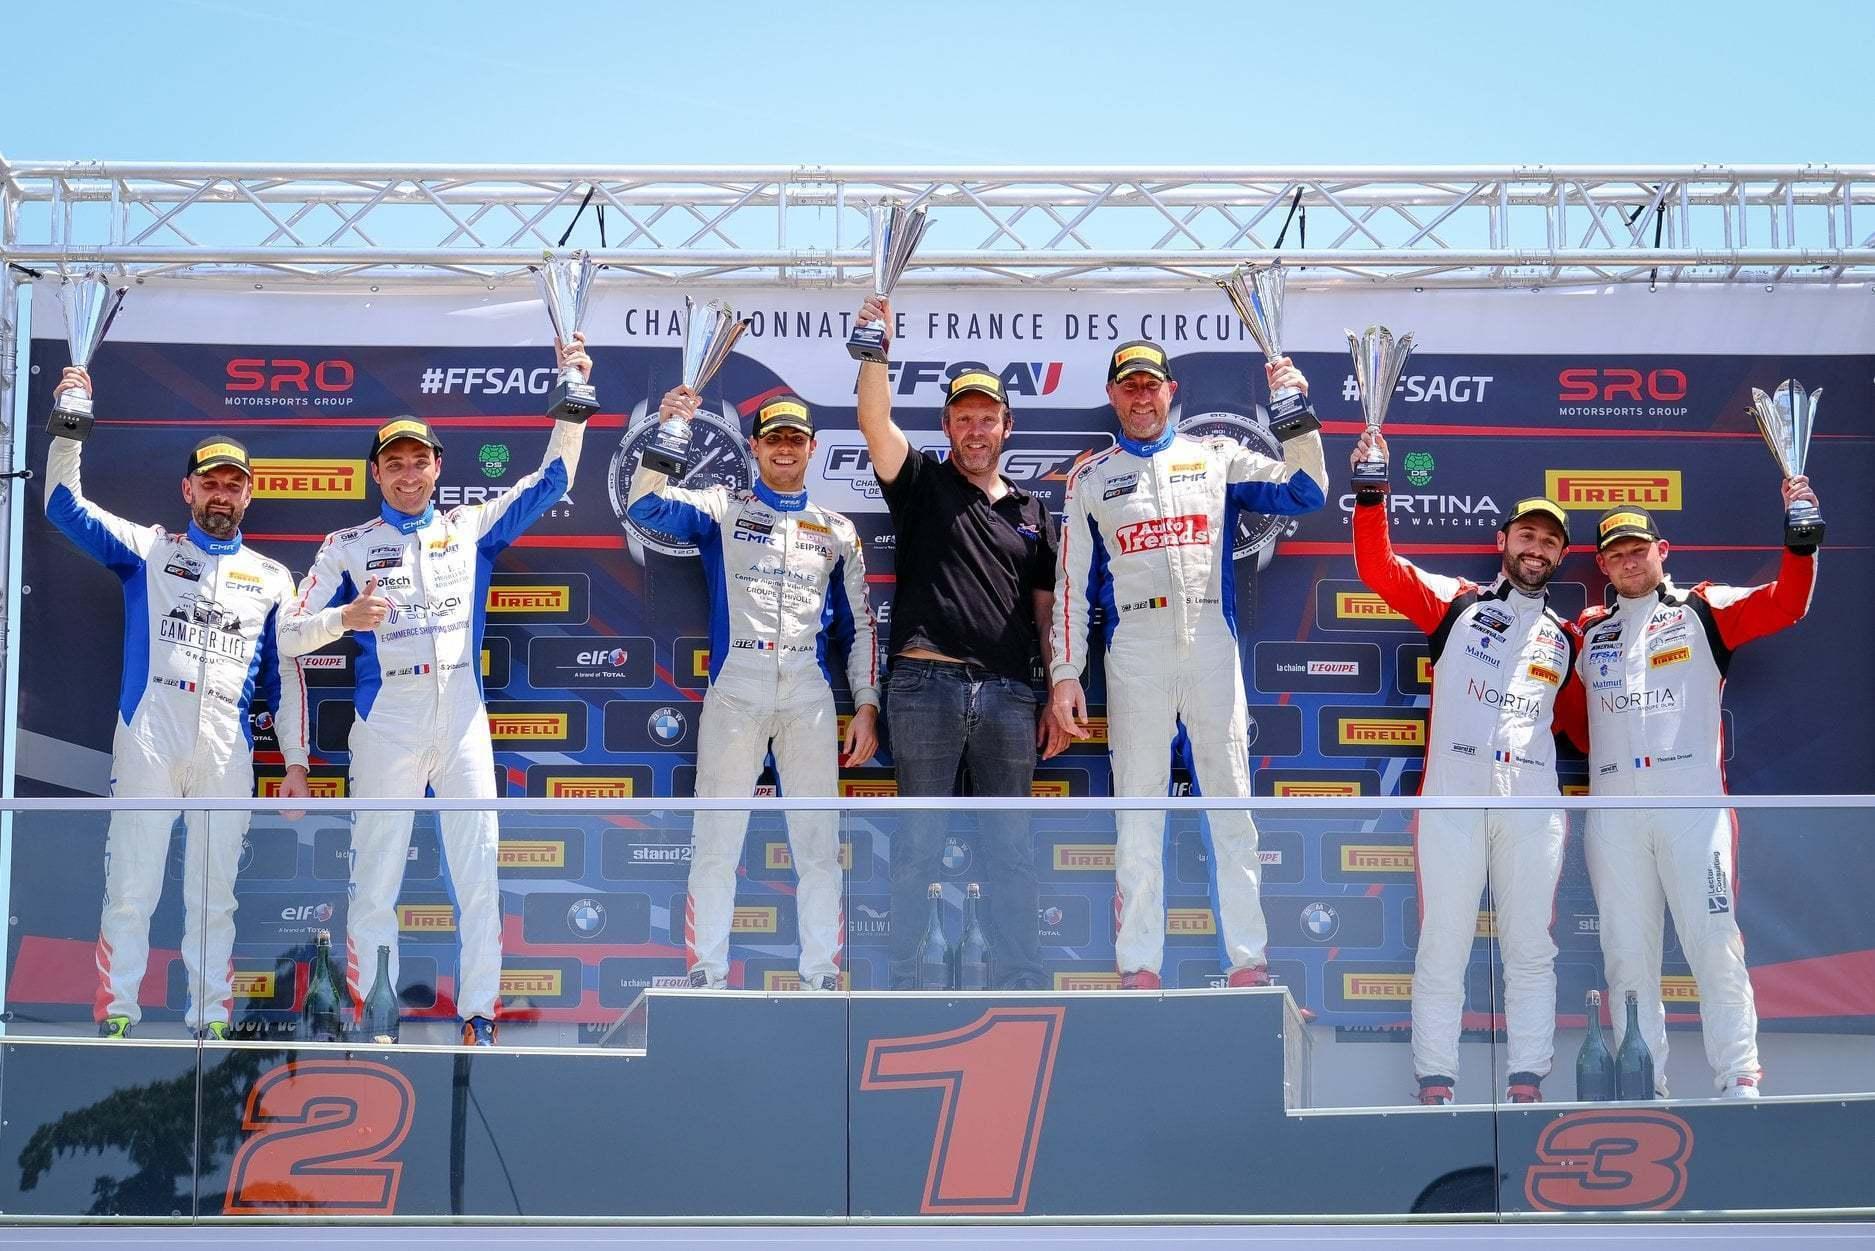 FFSA GT: CMR reprend la main Lédenon ! (Course 2) 4